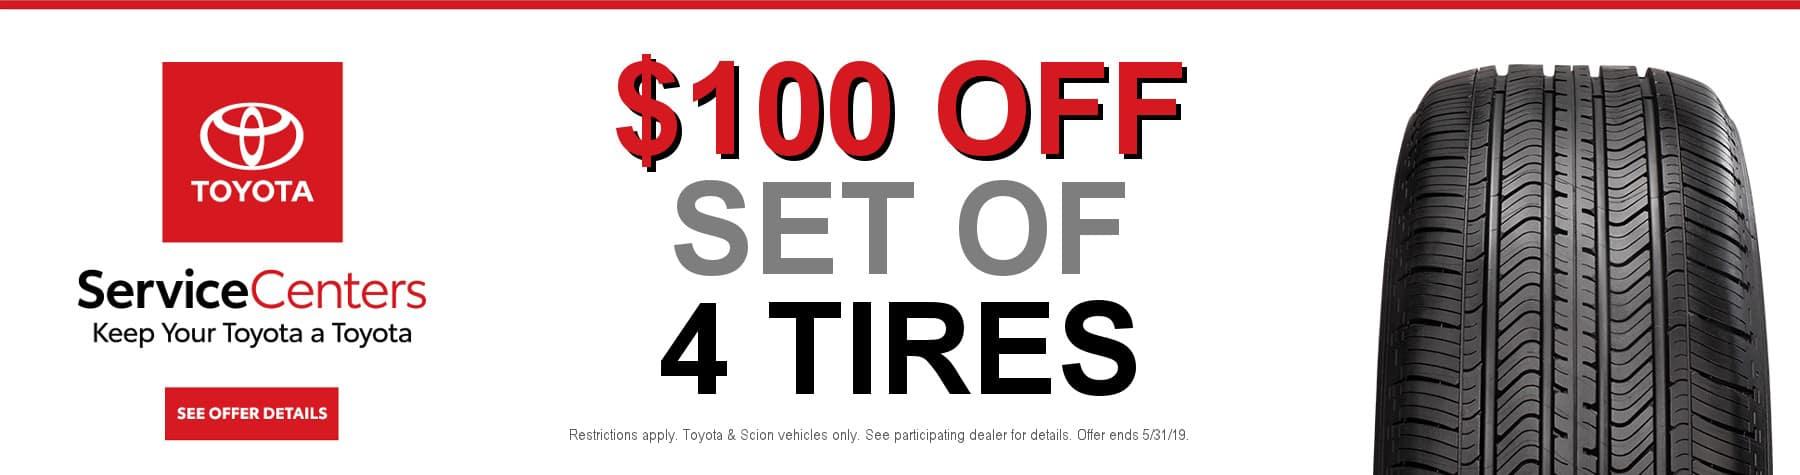 Toyota Service - Toyota Tire Coupon